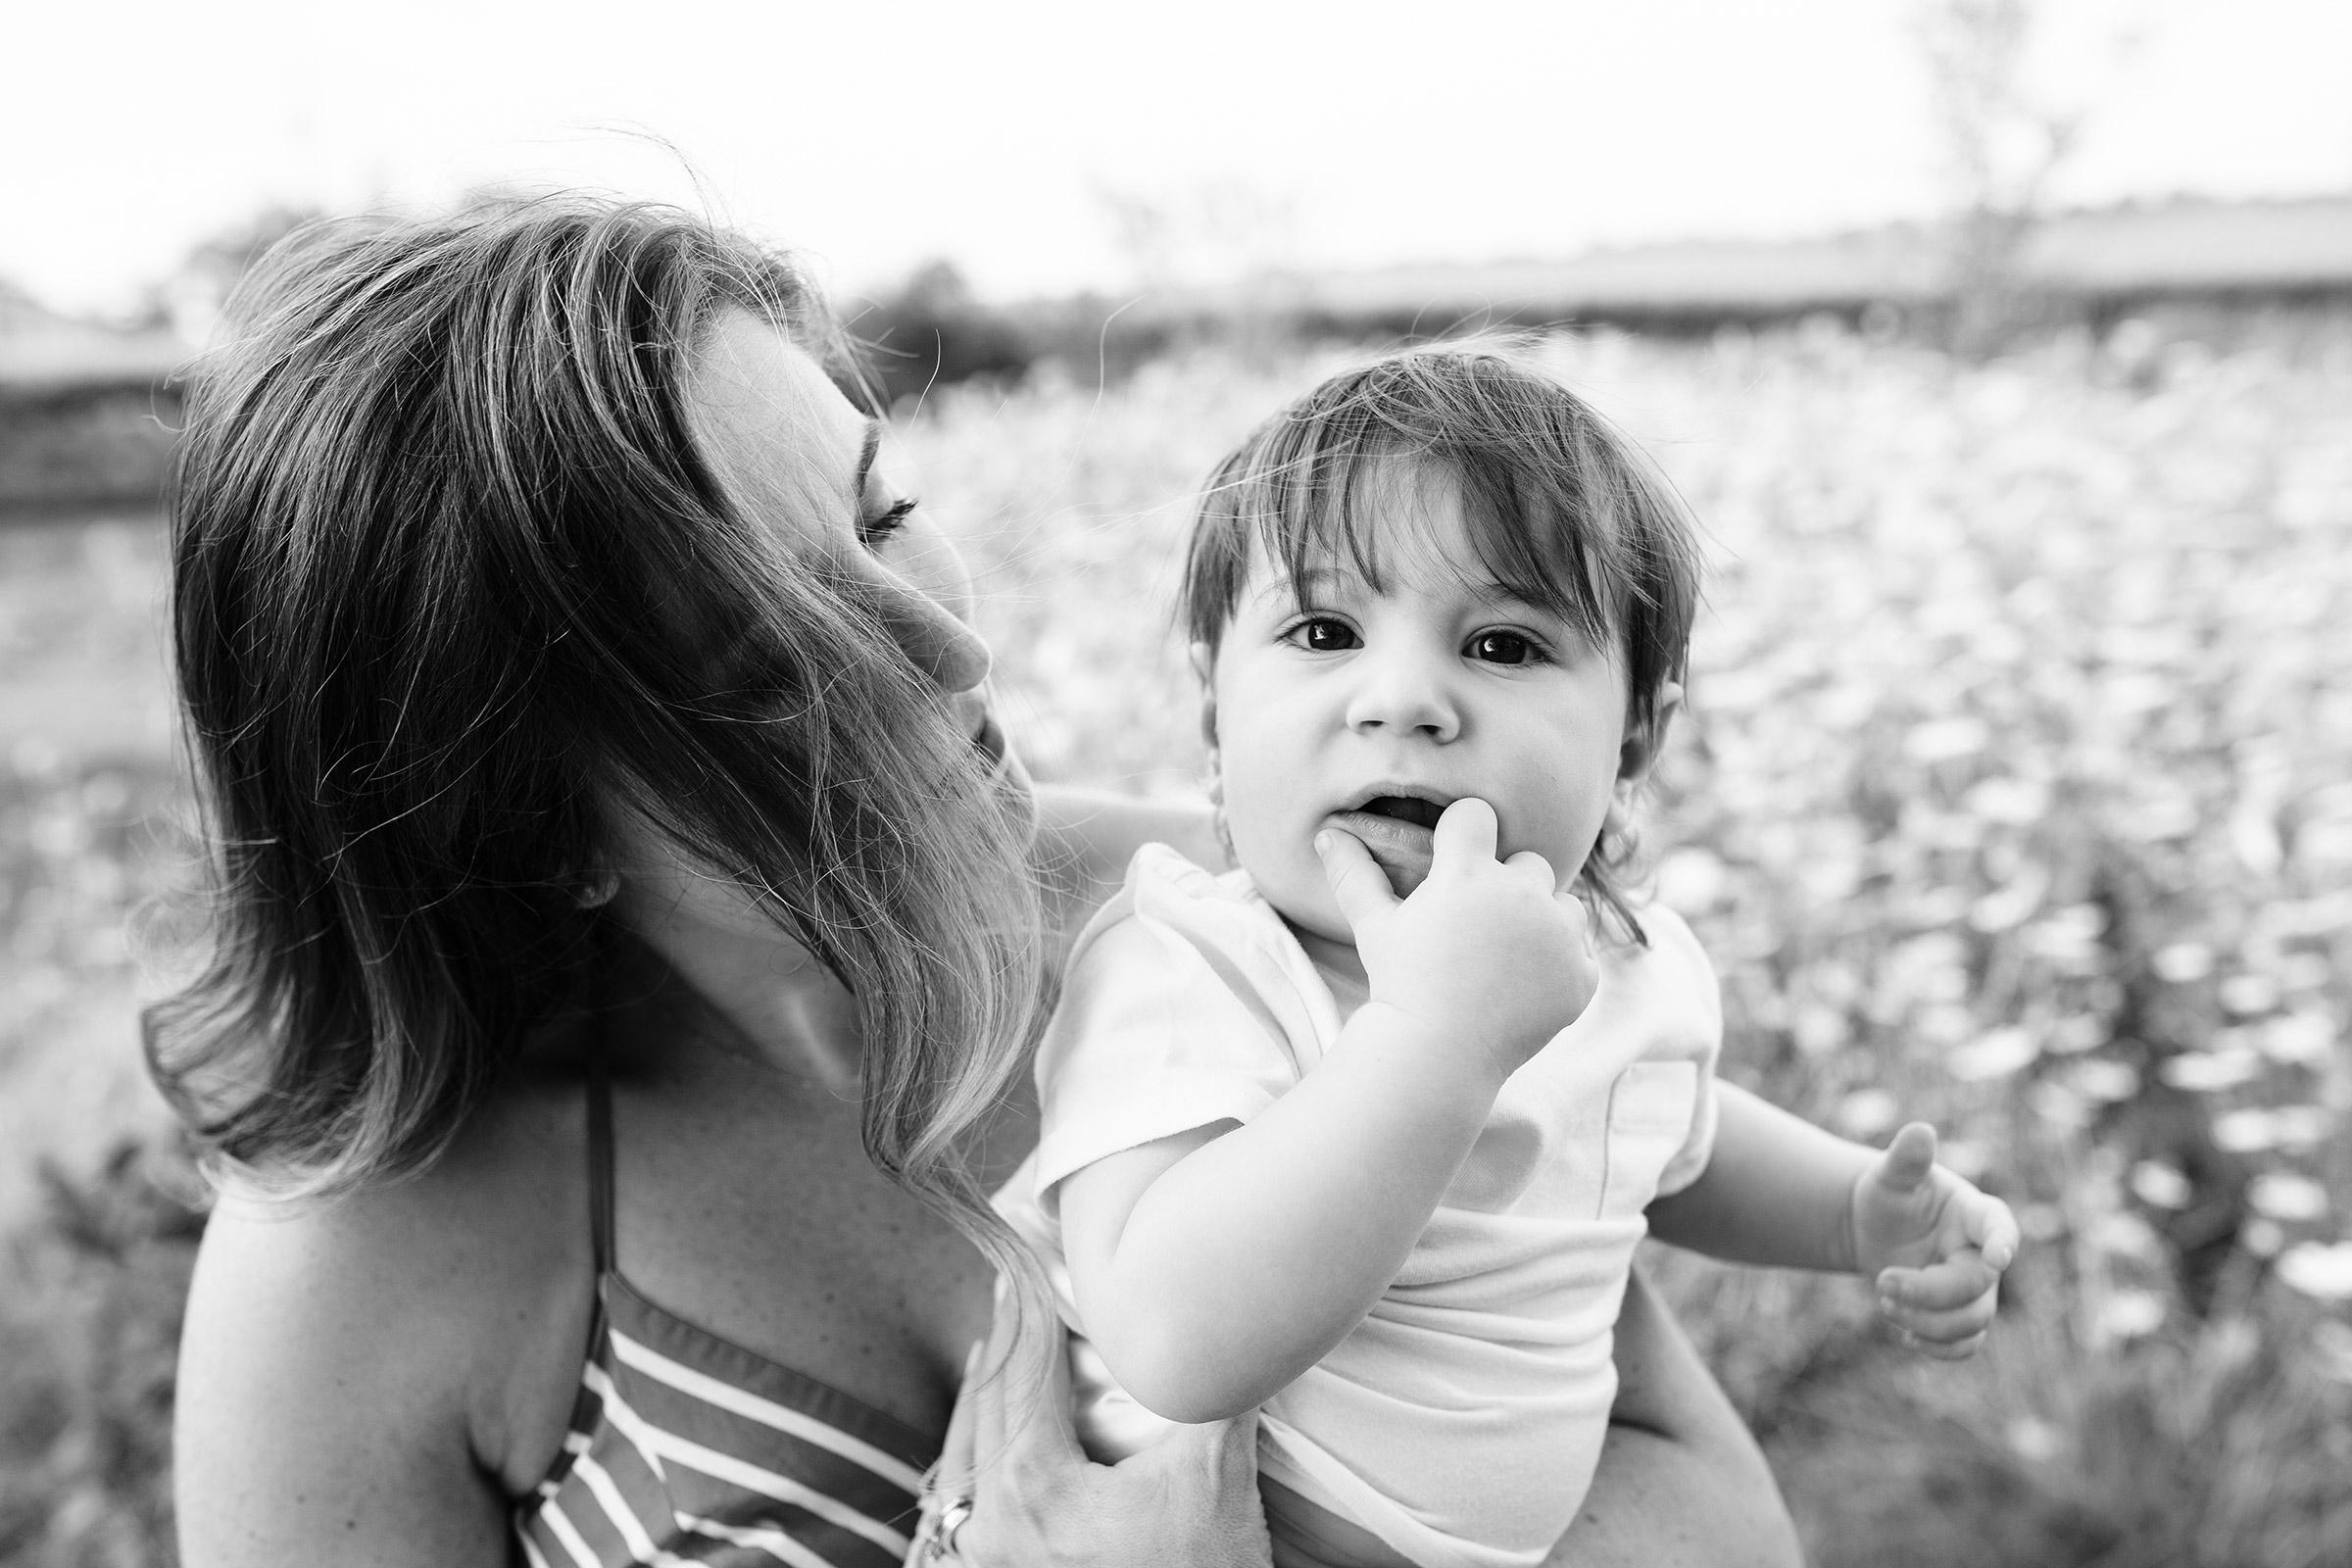 natale-family-mom-holding-son-black-and-white-iris-aisle--winterset-iowa-raelyn-ramey-photography-16.jpg